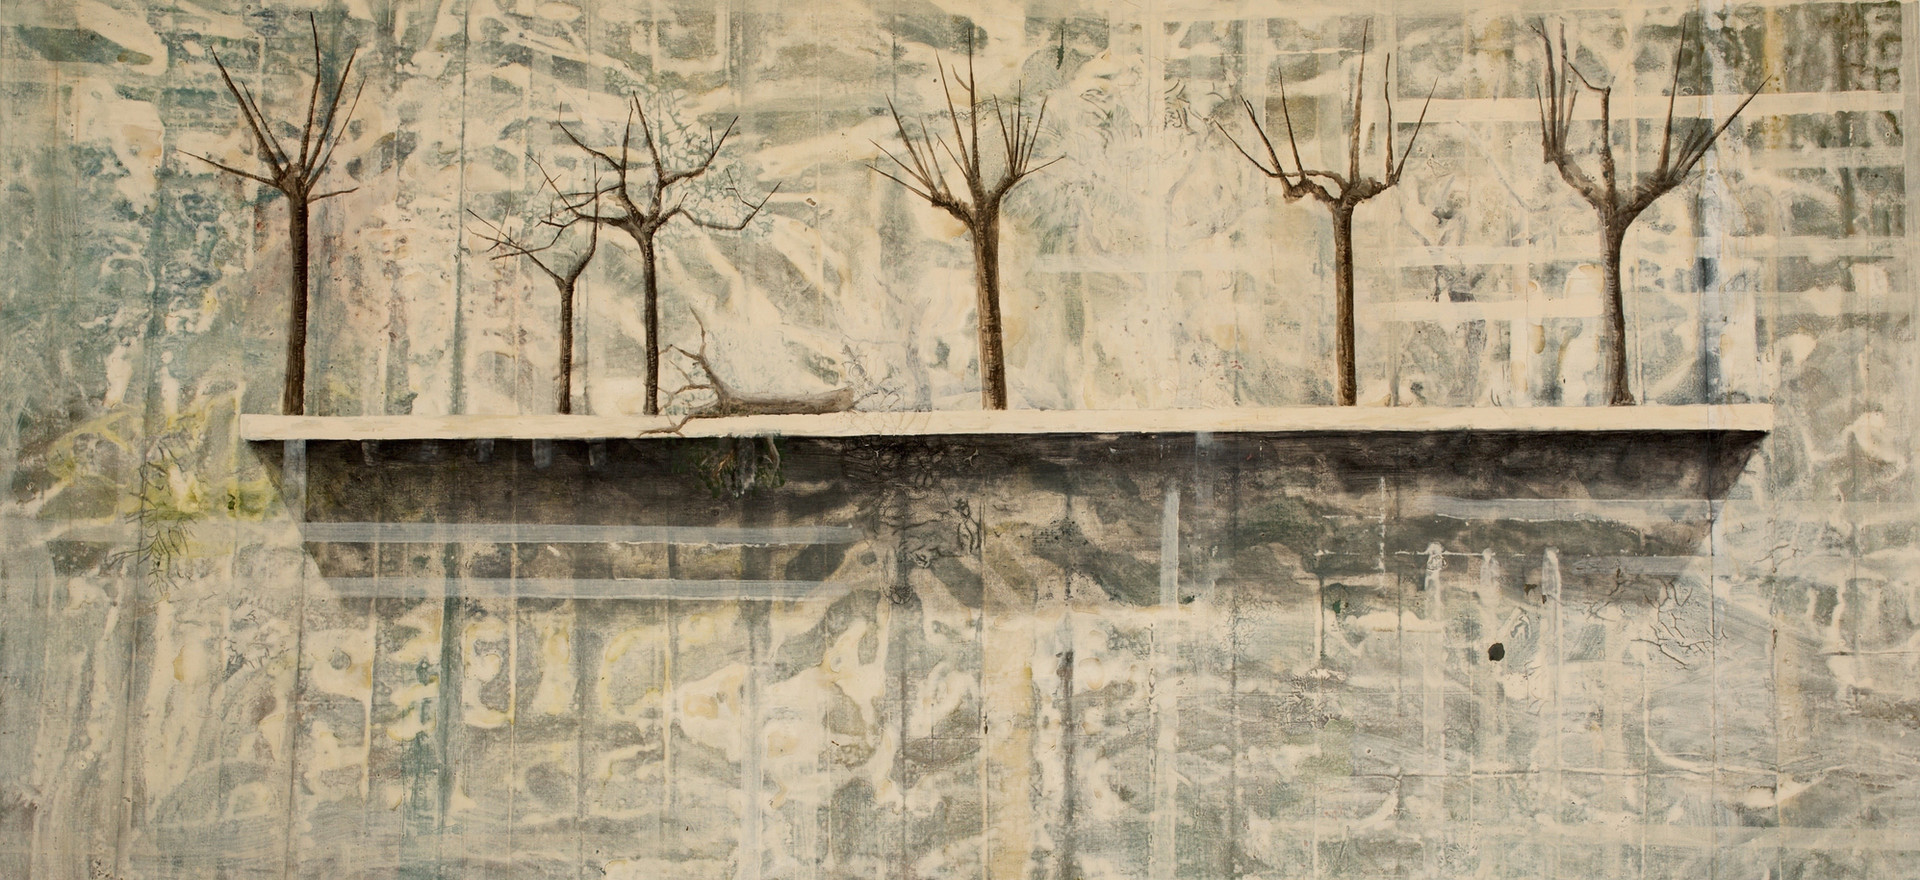 """Repisa con árboles"", 1991, Acrylic on canvas, 150 x 209 cm"